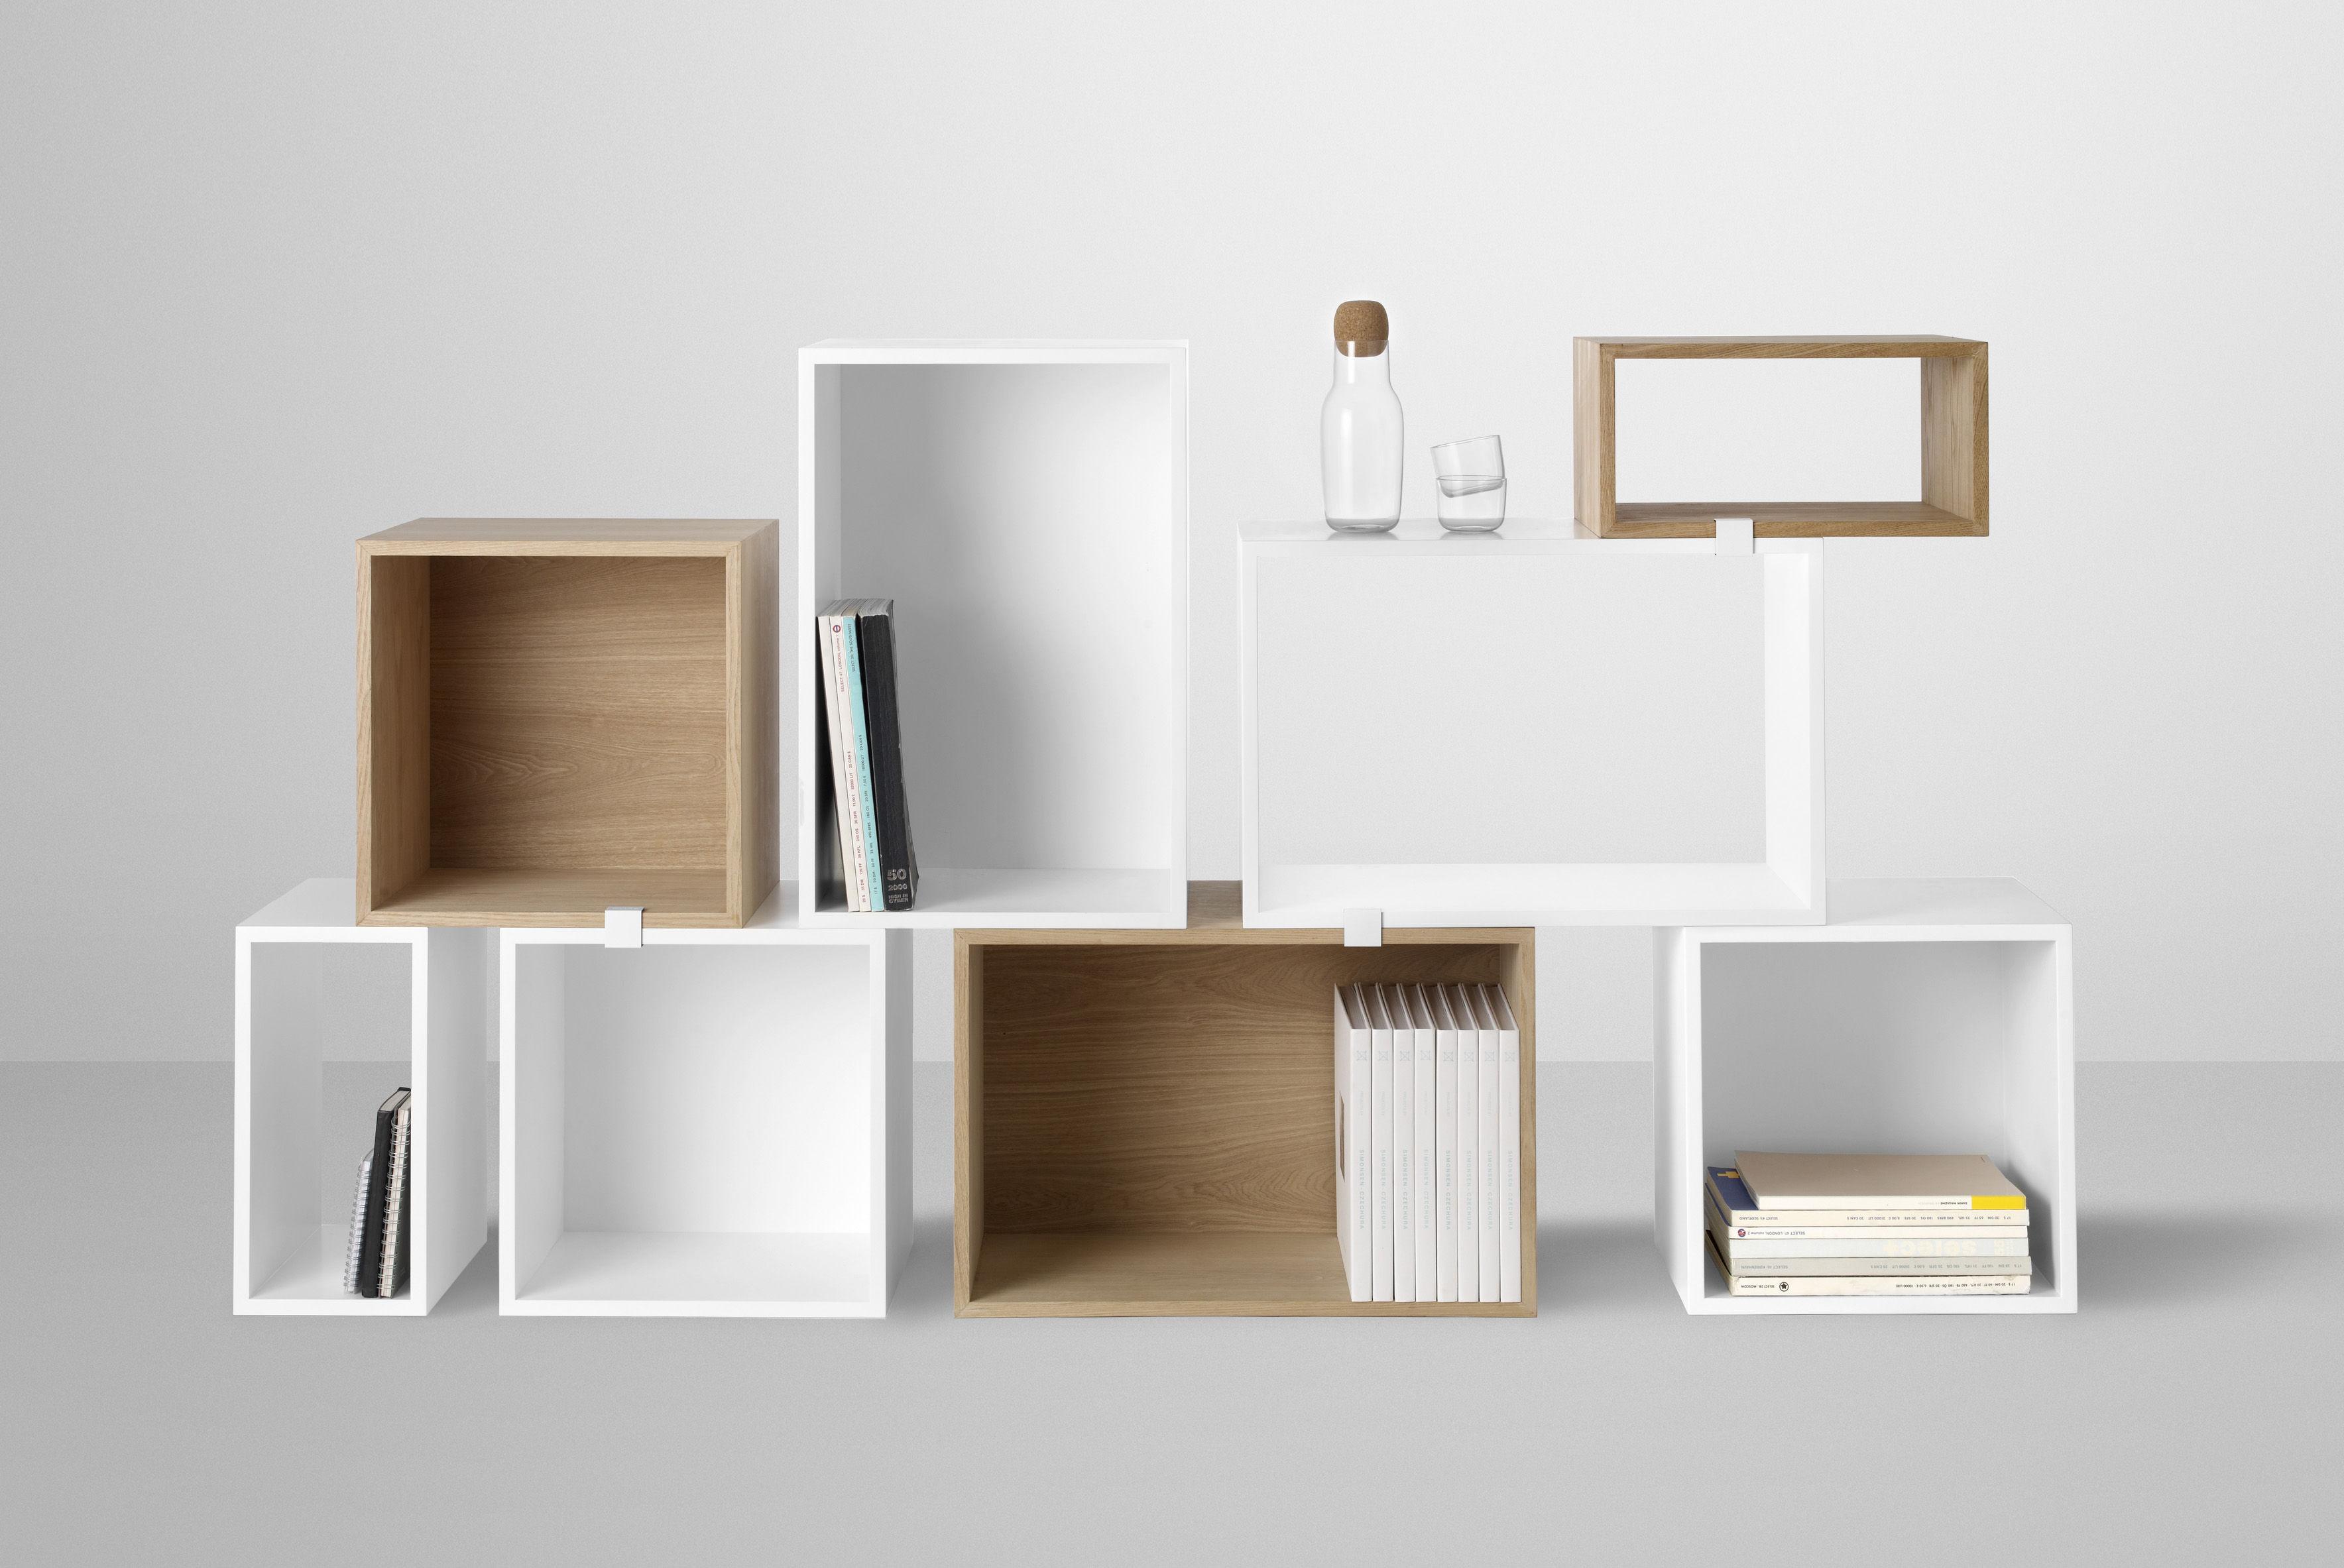 stacked quadratisches modul gr e m muuto regal. Black Bedroom Furniture Sets. Home Design Ideas